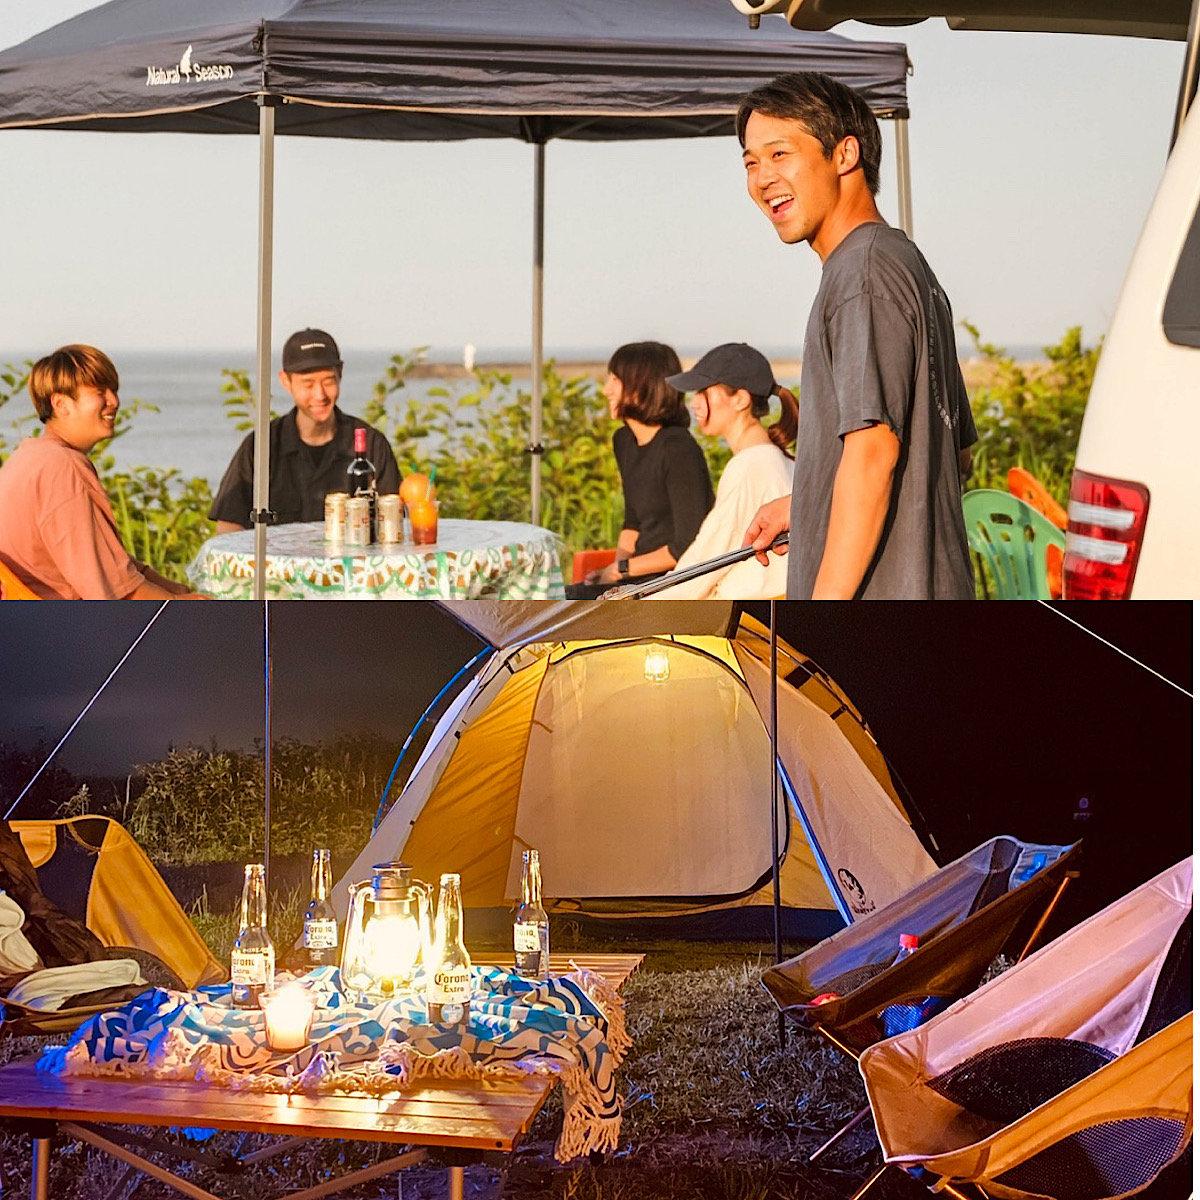 BBQ&Camp OceanPlan (6m×12m)/①②,③④,⑤⑥